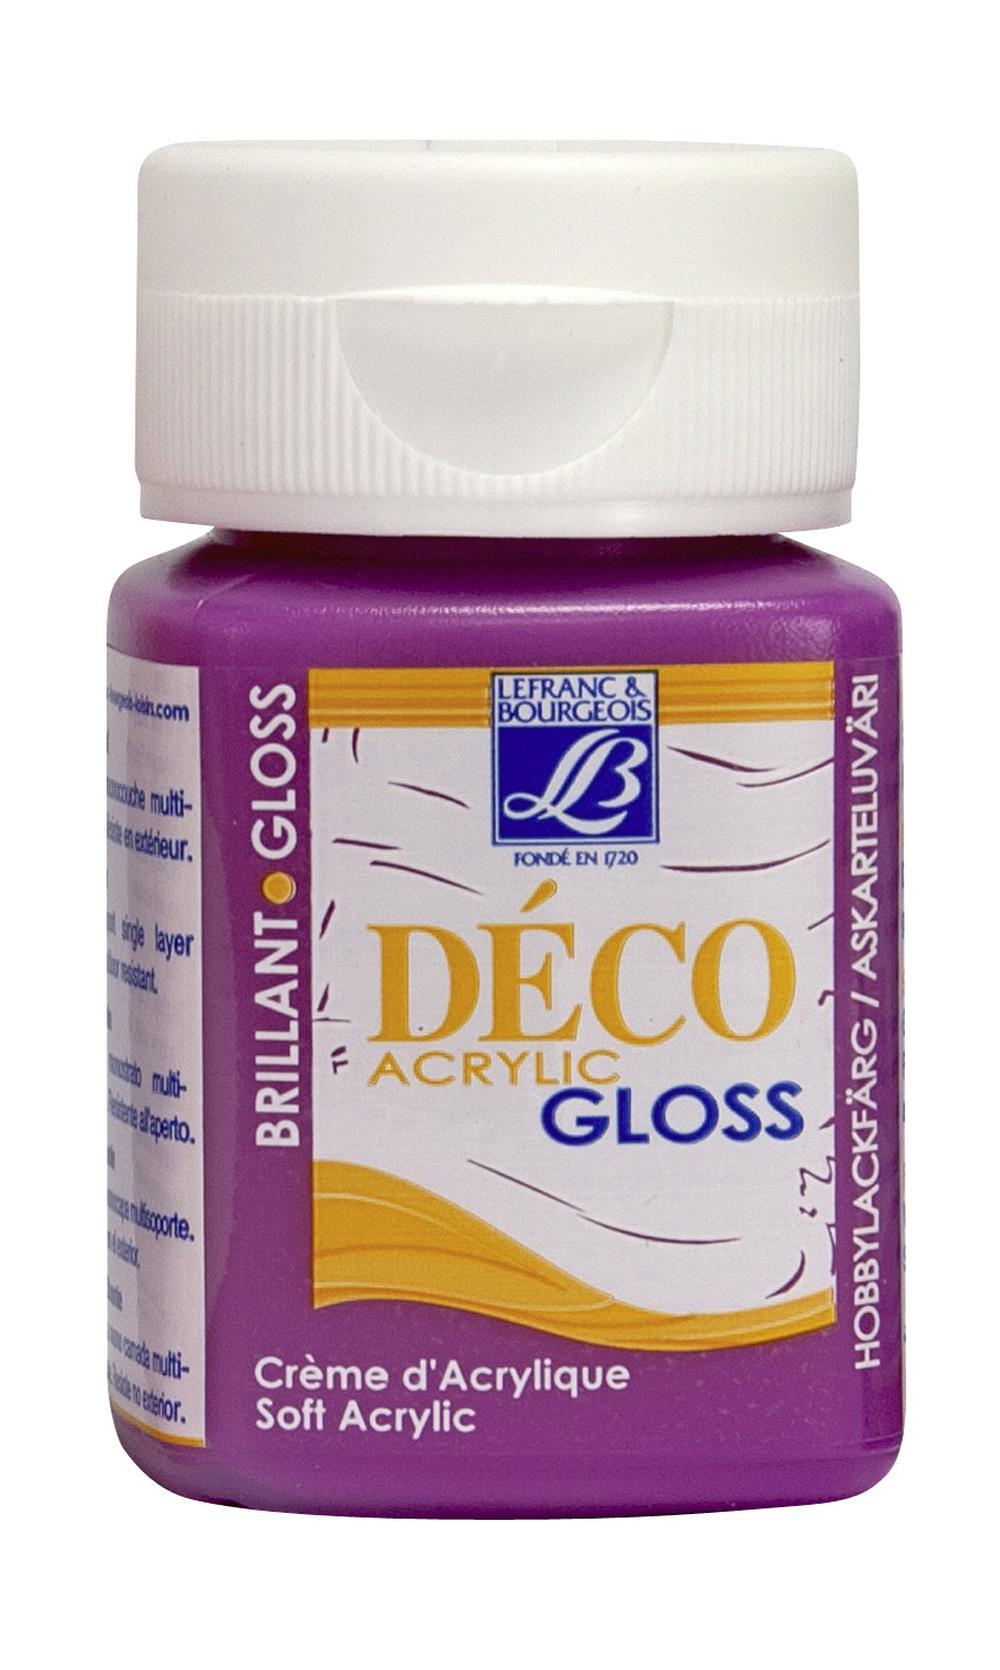 Hobbyfärg L&B Deco Gloss Akryl 50ml  Fuchsia 443 (4F) Utgår